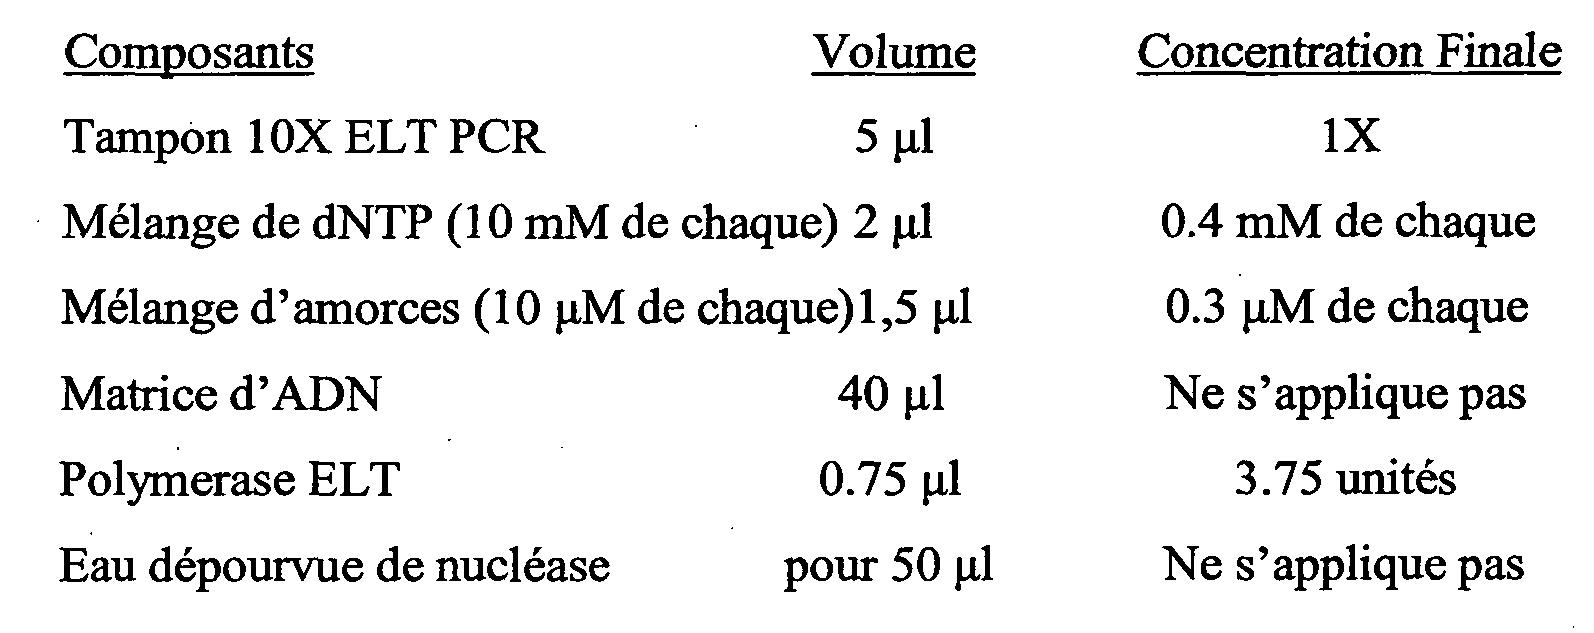 patent wo2010130898a2 menigococcus vaccine containing lipooligosaccharide los from modified. Black Bedroom Furniture Sets. Home Design Ideas